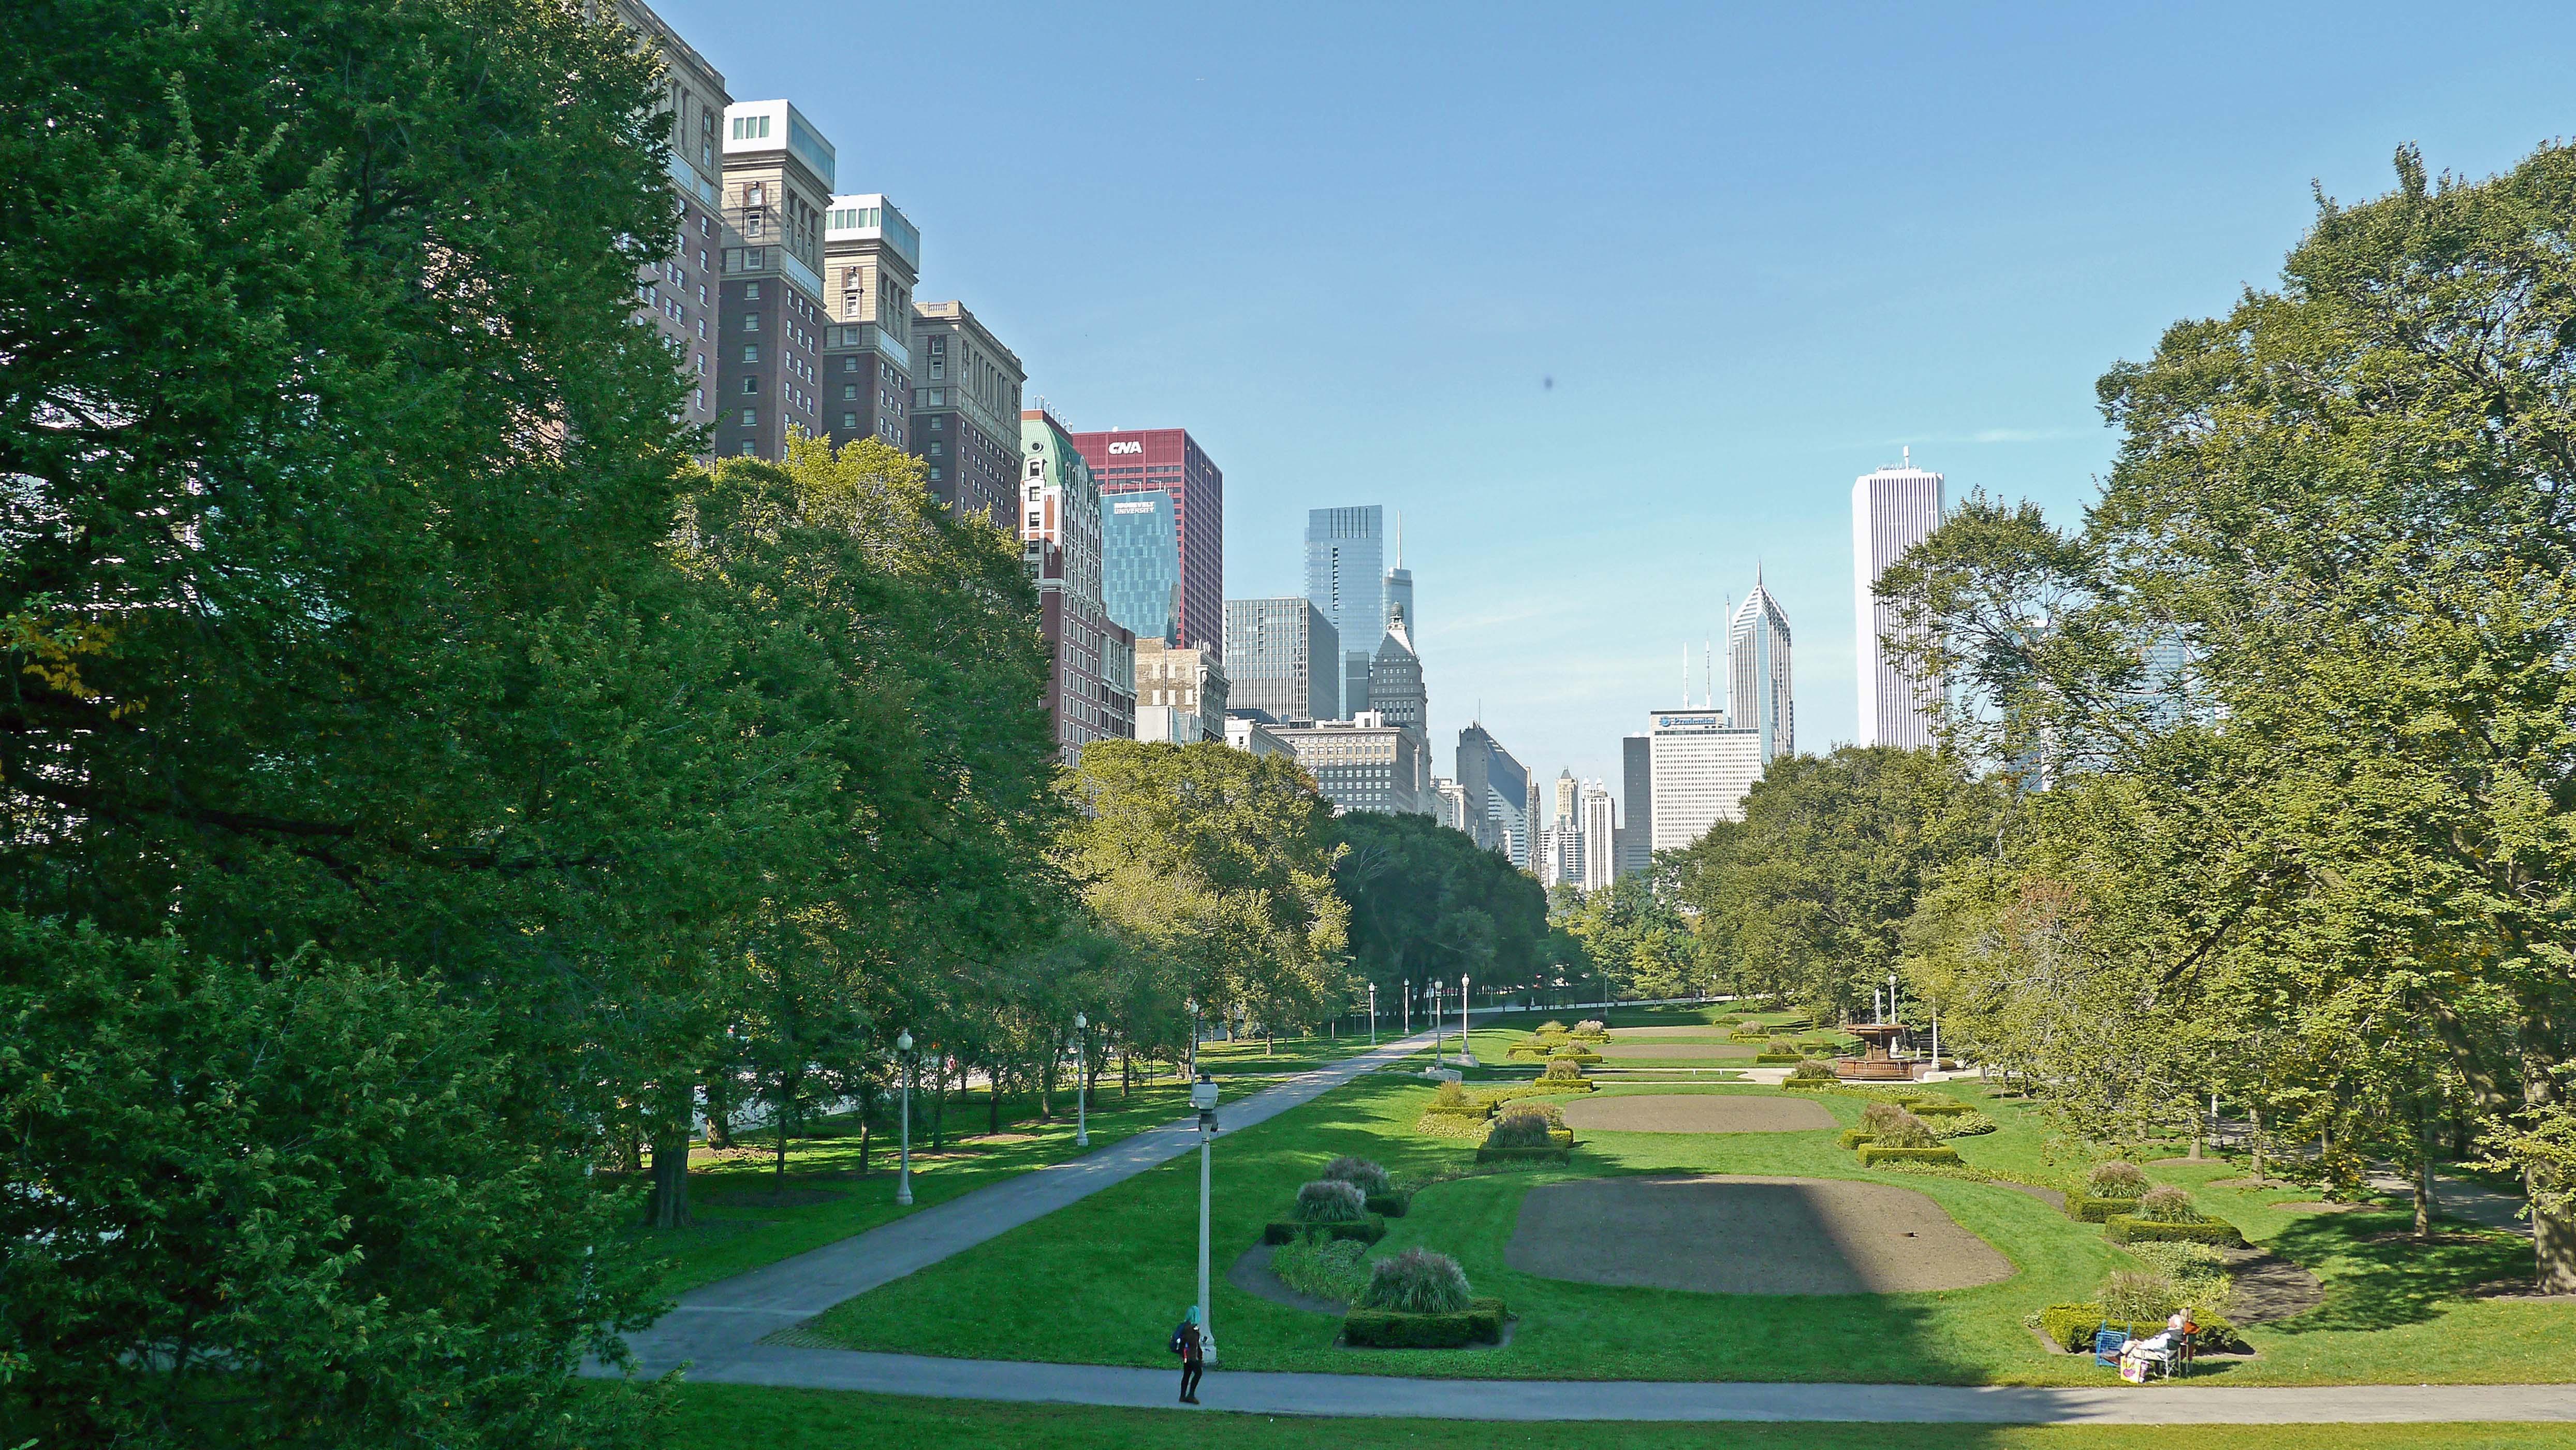 Views Of Grant Park And Millennium Park Yochicago